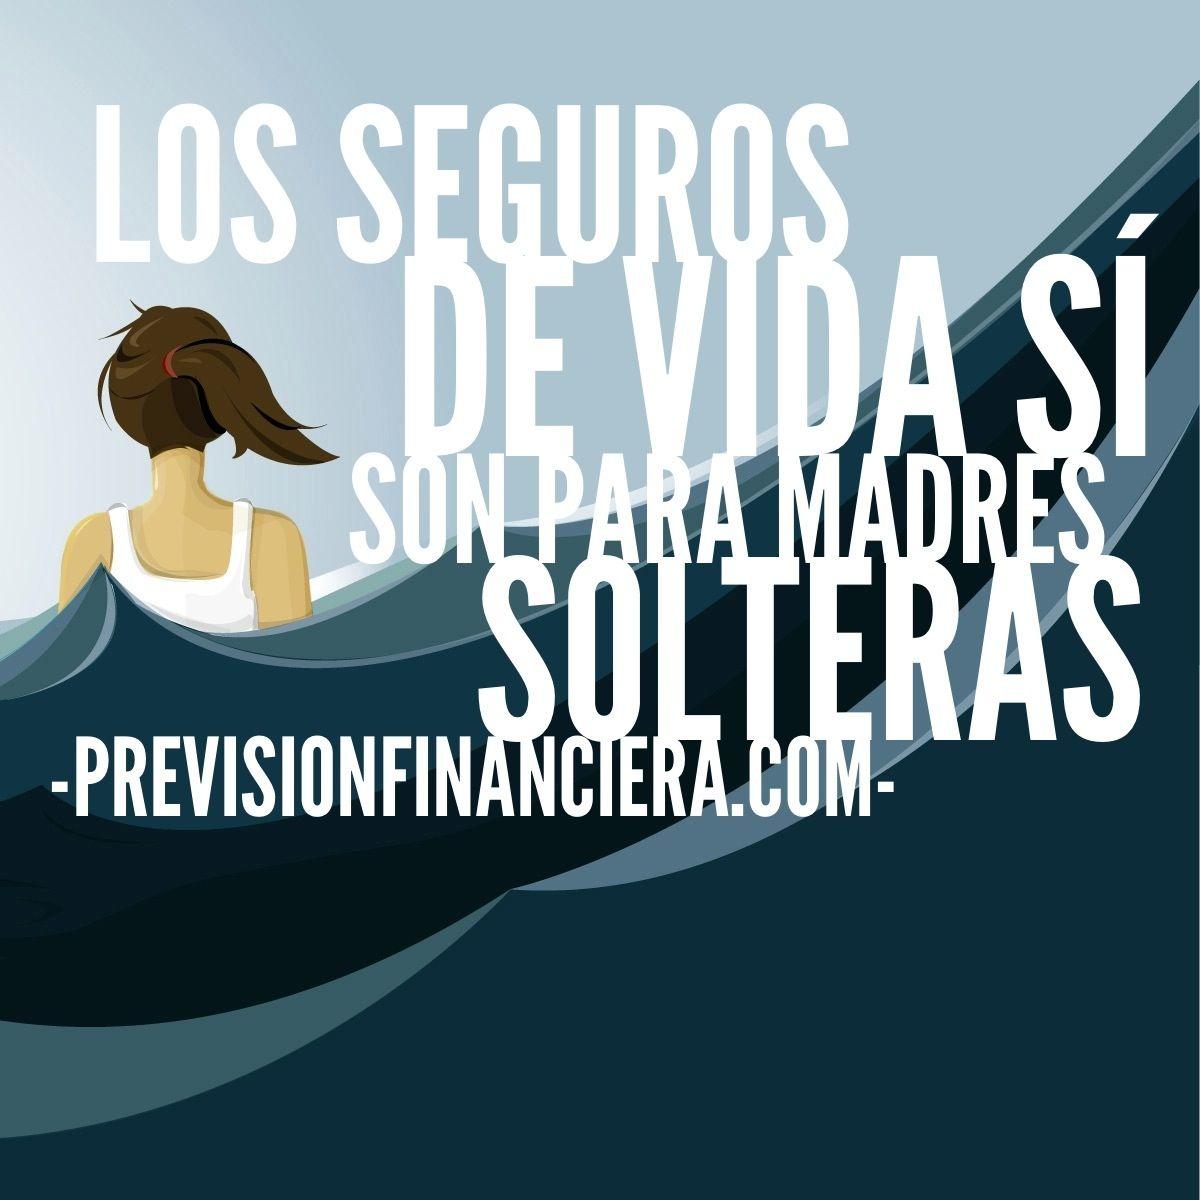 Good Life Insurance Quotes: Los Seguros De Vida SÍ Son Para Madres Solteras. Descubre